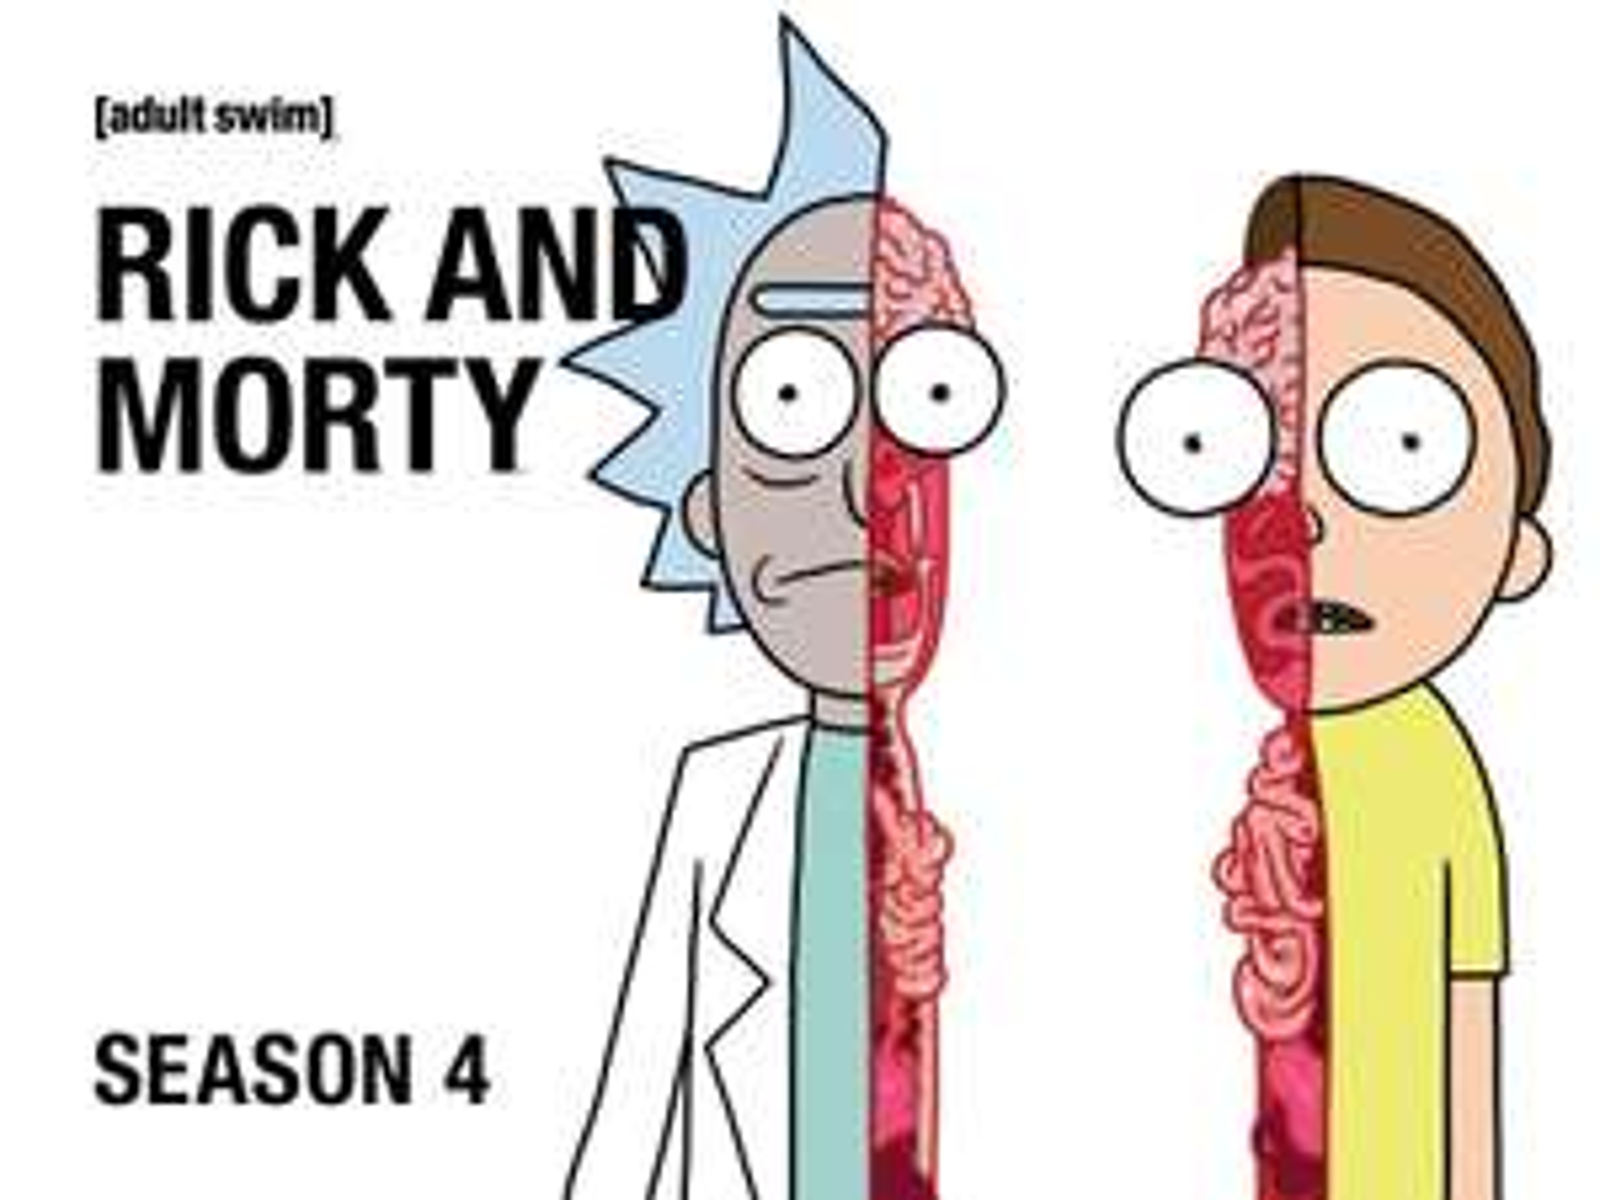 Rick and Morty Season 4 kostenlos (Xbox 360 & US Acc notwendig)